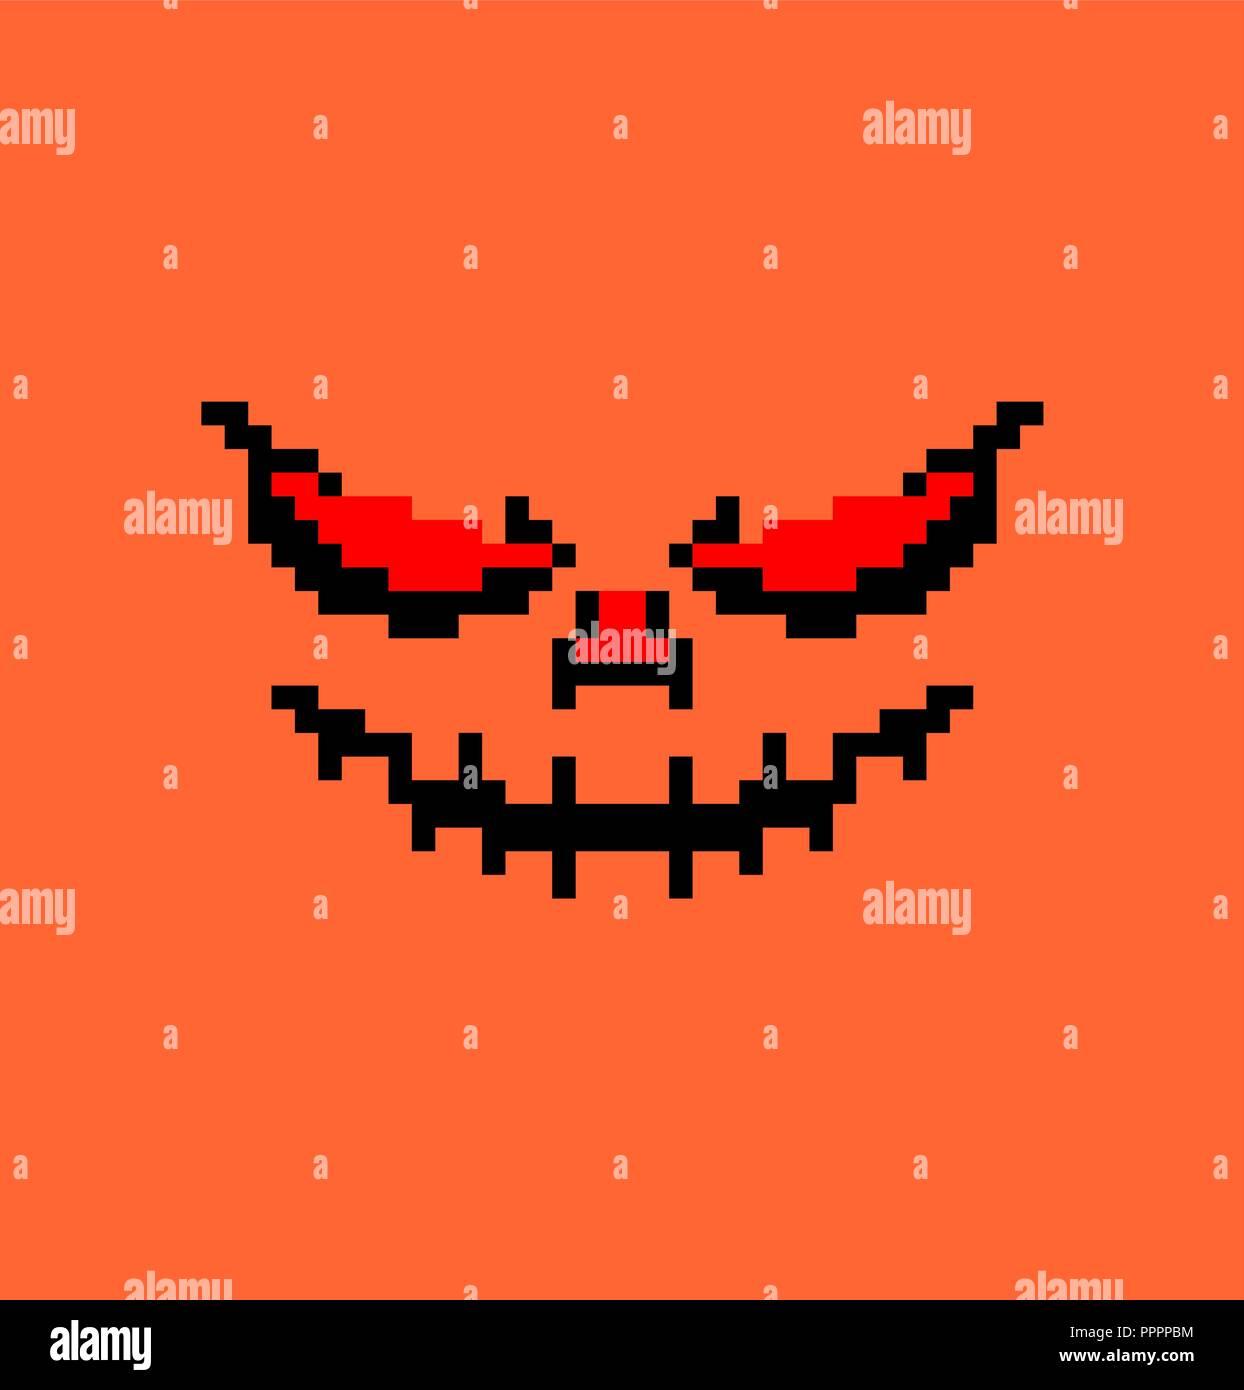 Pumpkin Halloween Pixel Art Horror Symbol 8 Bit Stock